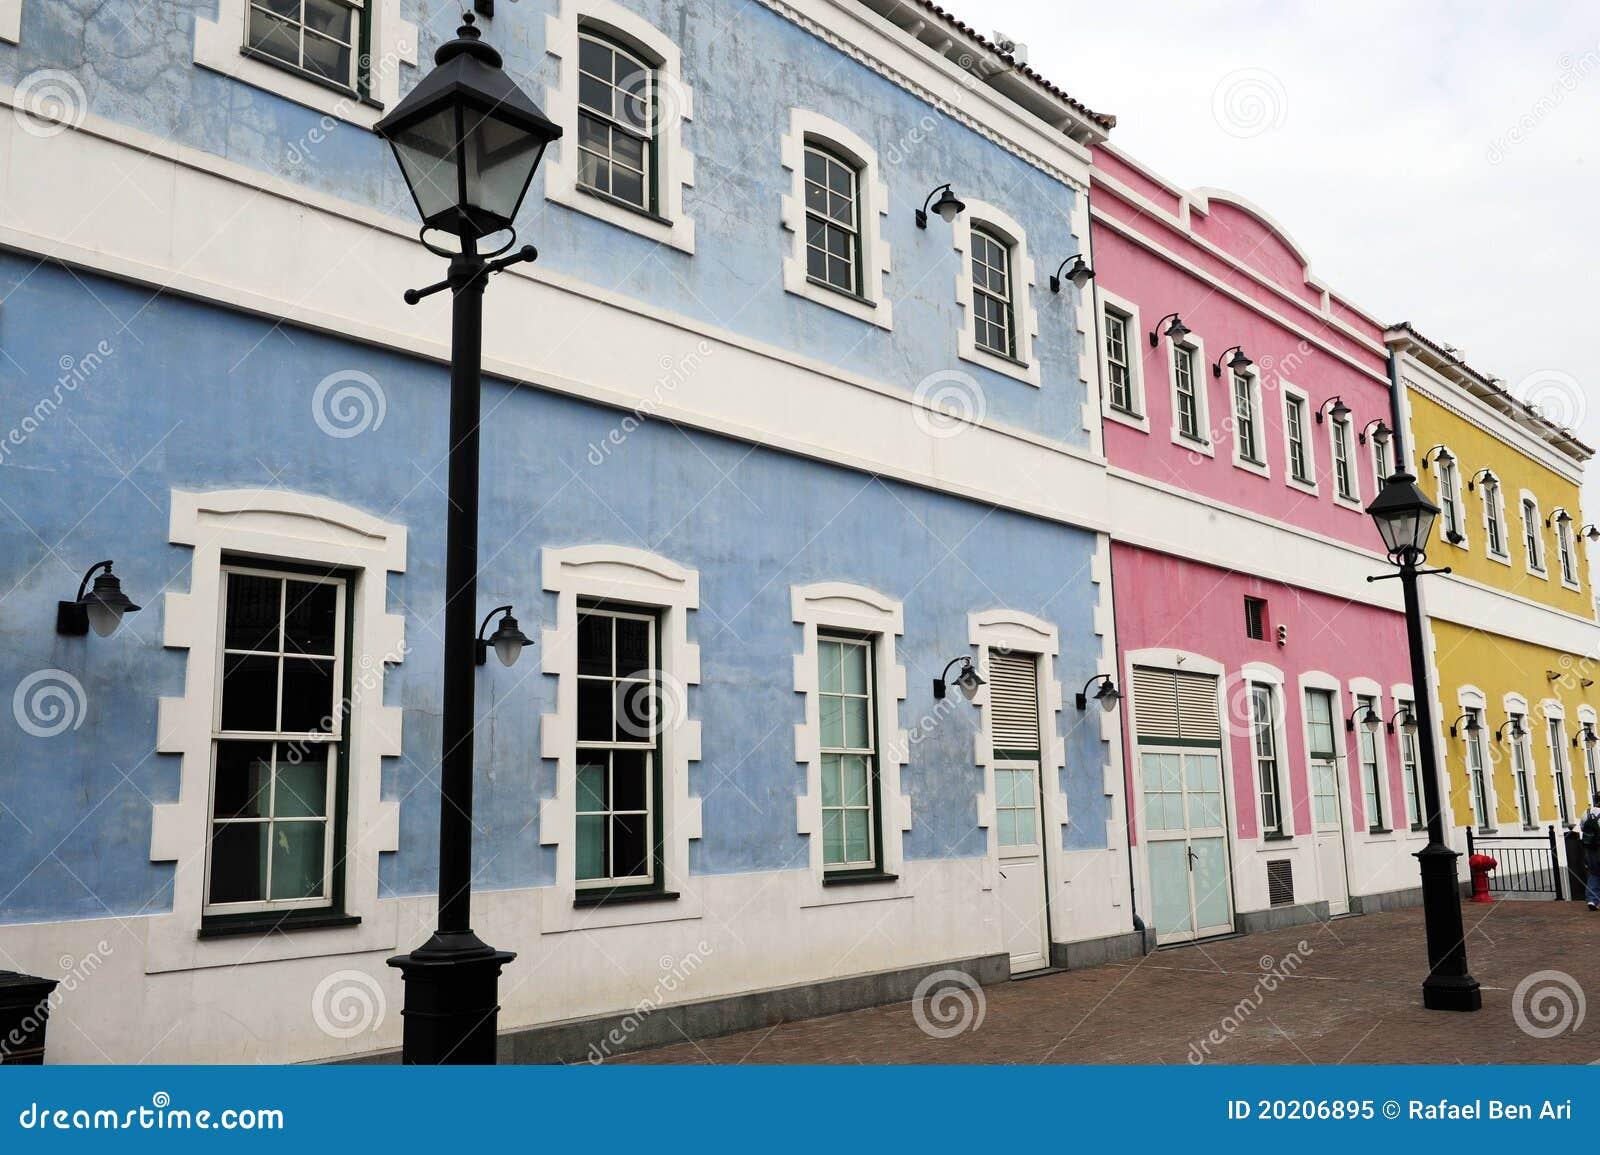 Portuguese Architecture Royalty Free Stock Photo Image